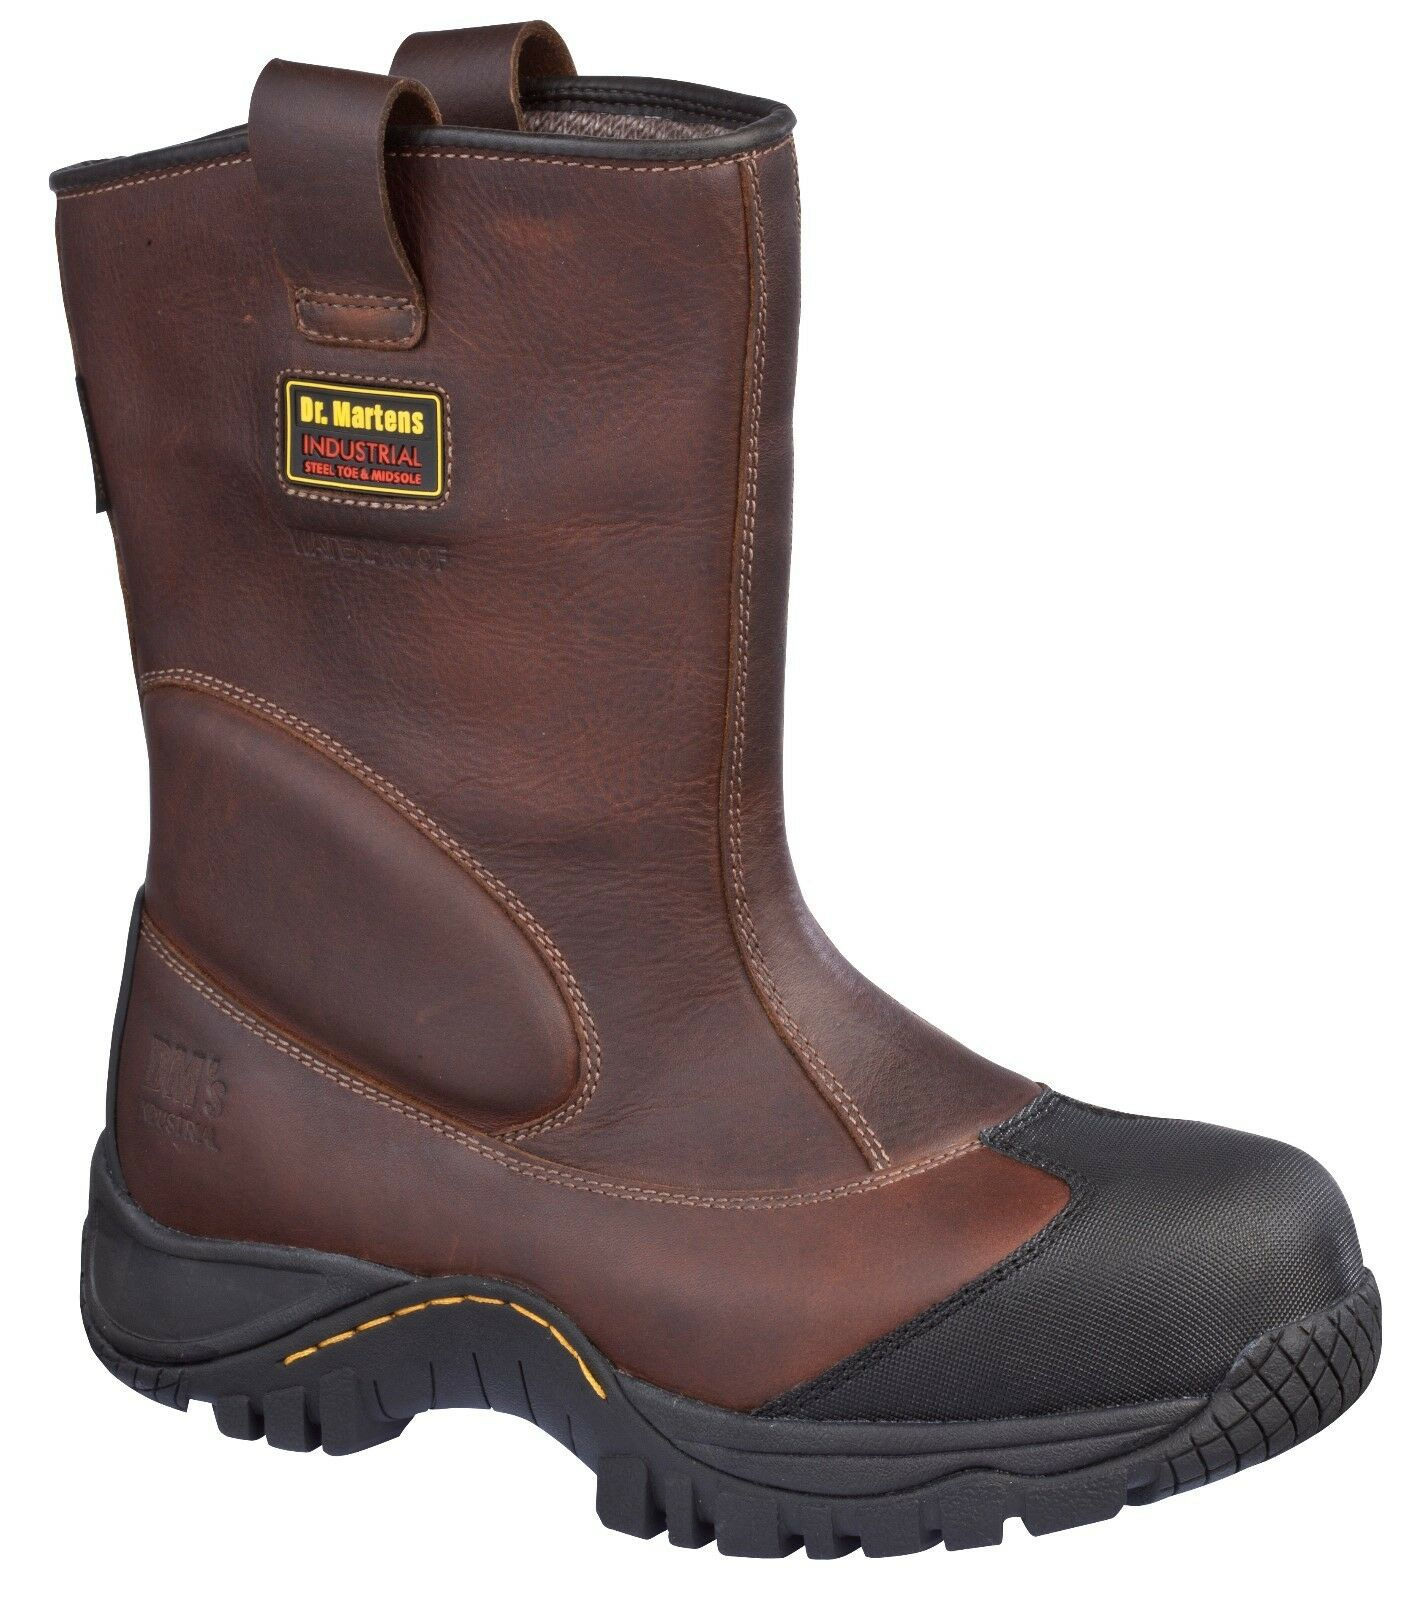 Dr. Martens Arbeitsschuh, Outland robuster Leder Stiefel, braun S3